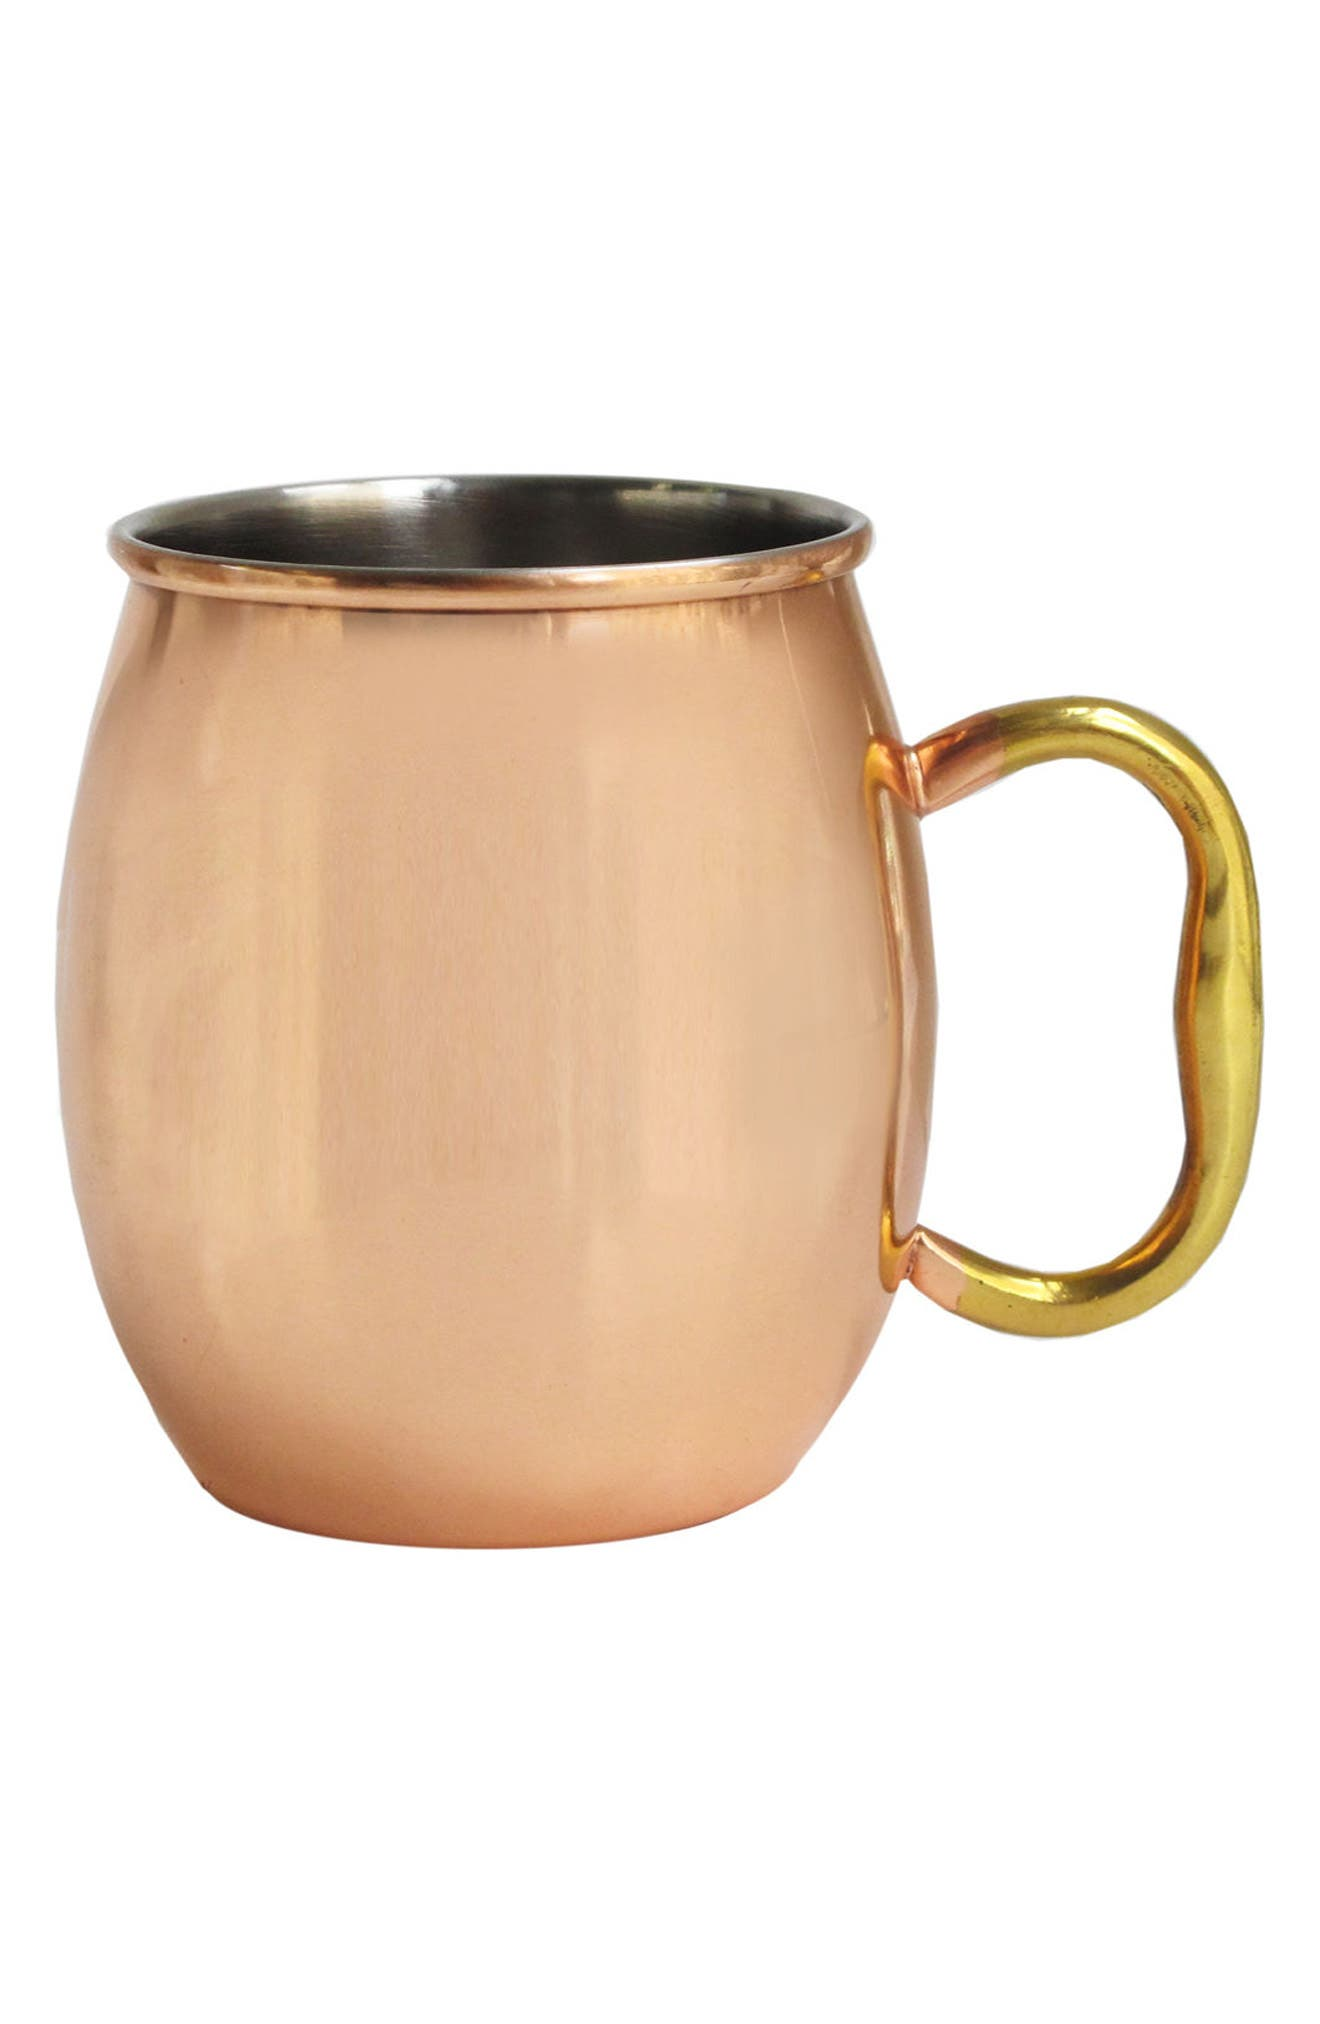 Moscow Mule Mug,                             Main thumbnail 1, color,                             COPPER